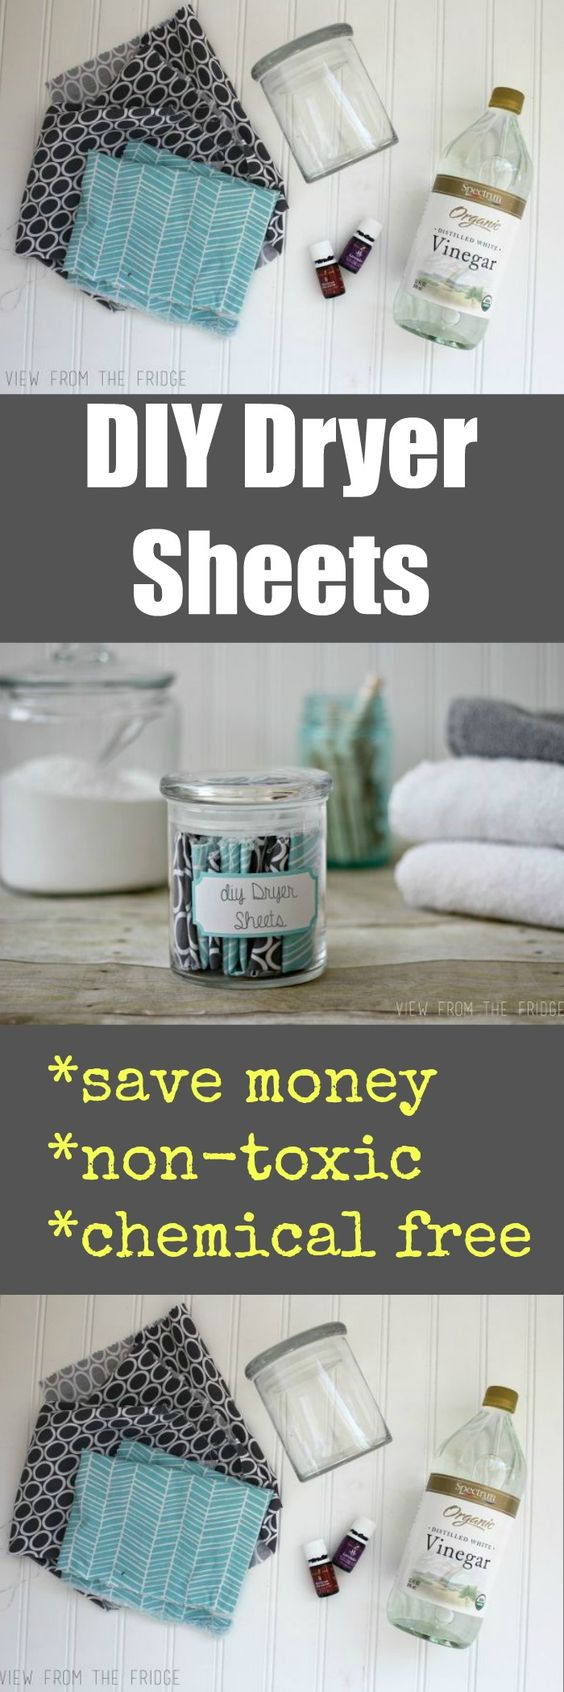 homemade diy dryer sheets homemade scrap fabric and fabrics. Black Bedroom Furniture Sets. Home Design Ideas